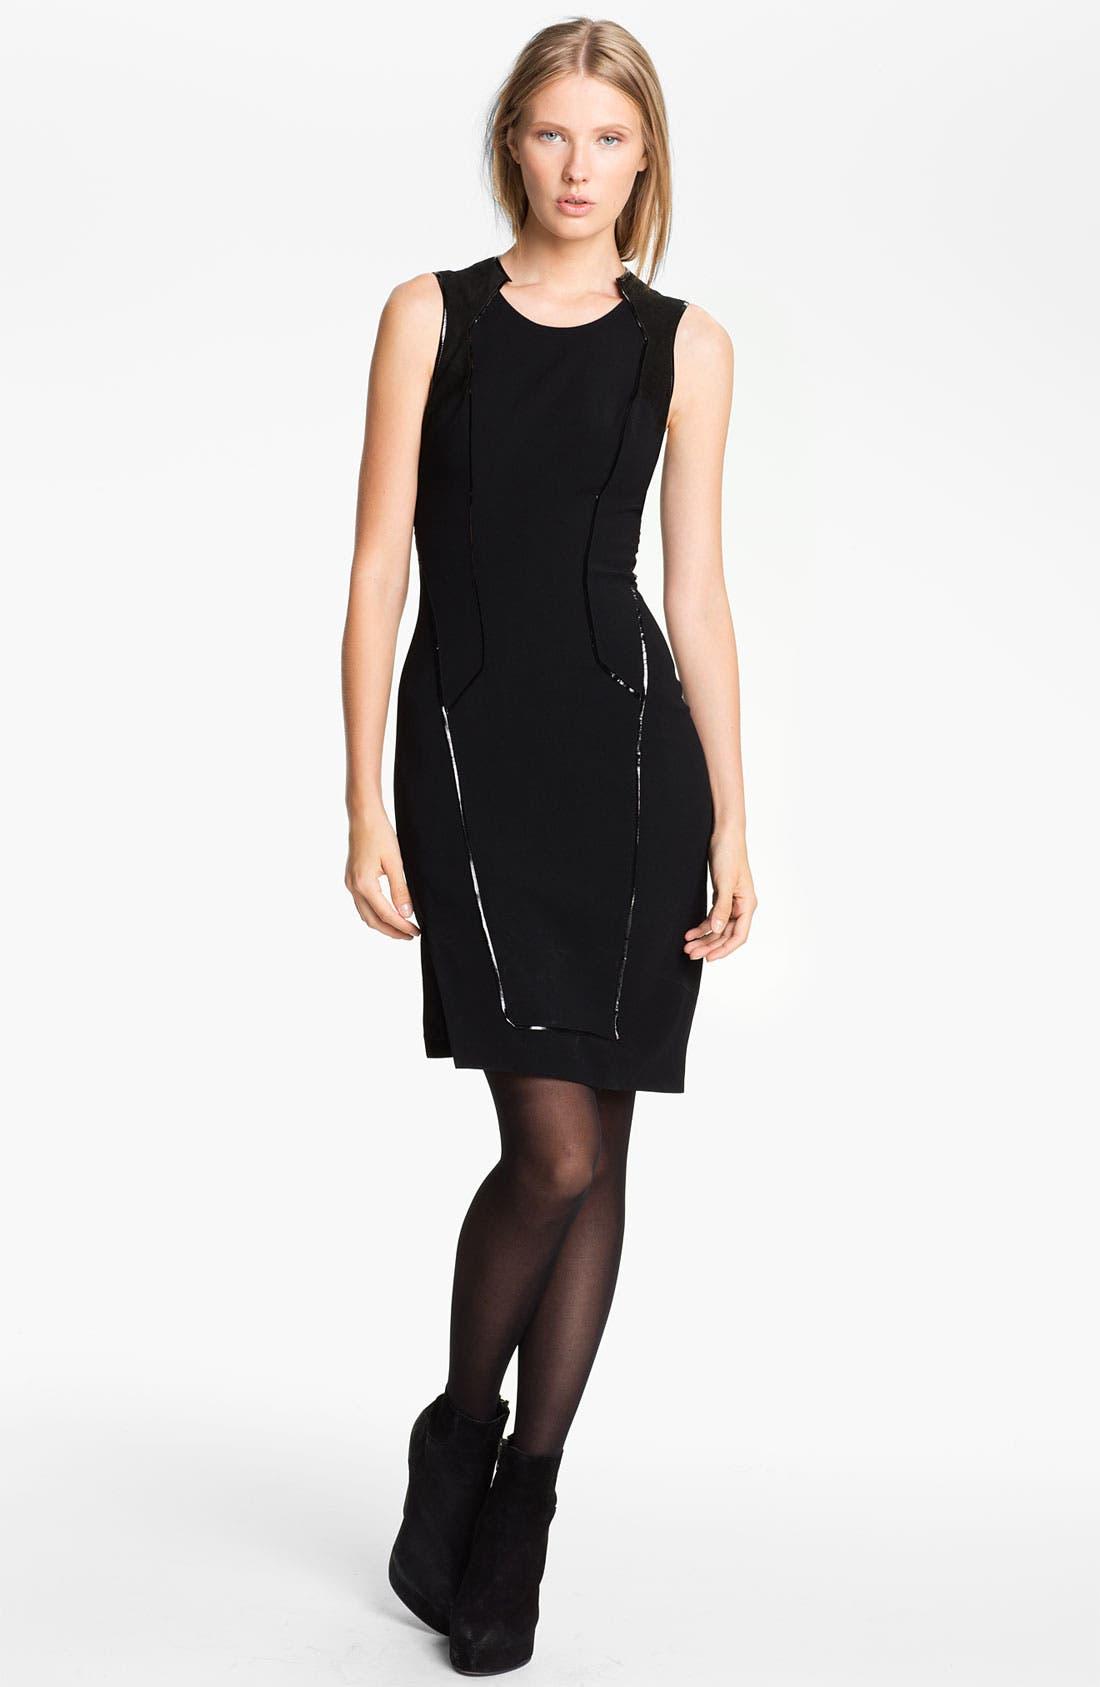 Alternate Image 1 Selected - Helmut Lang Seam Detail Dress